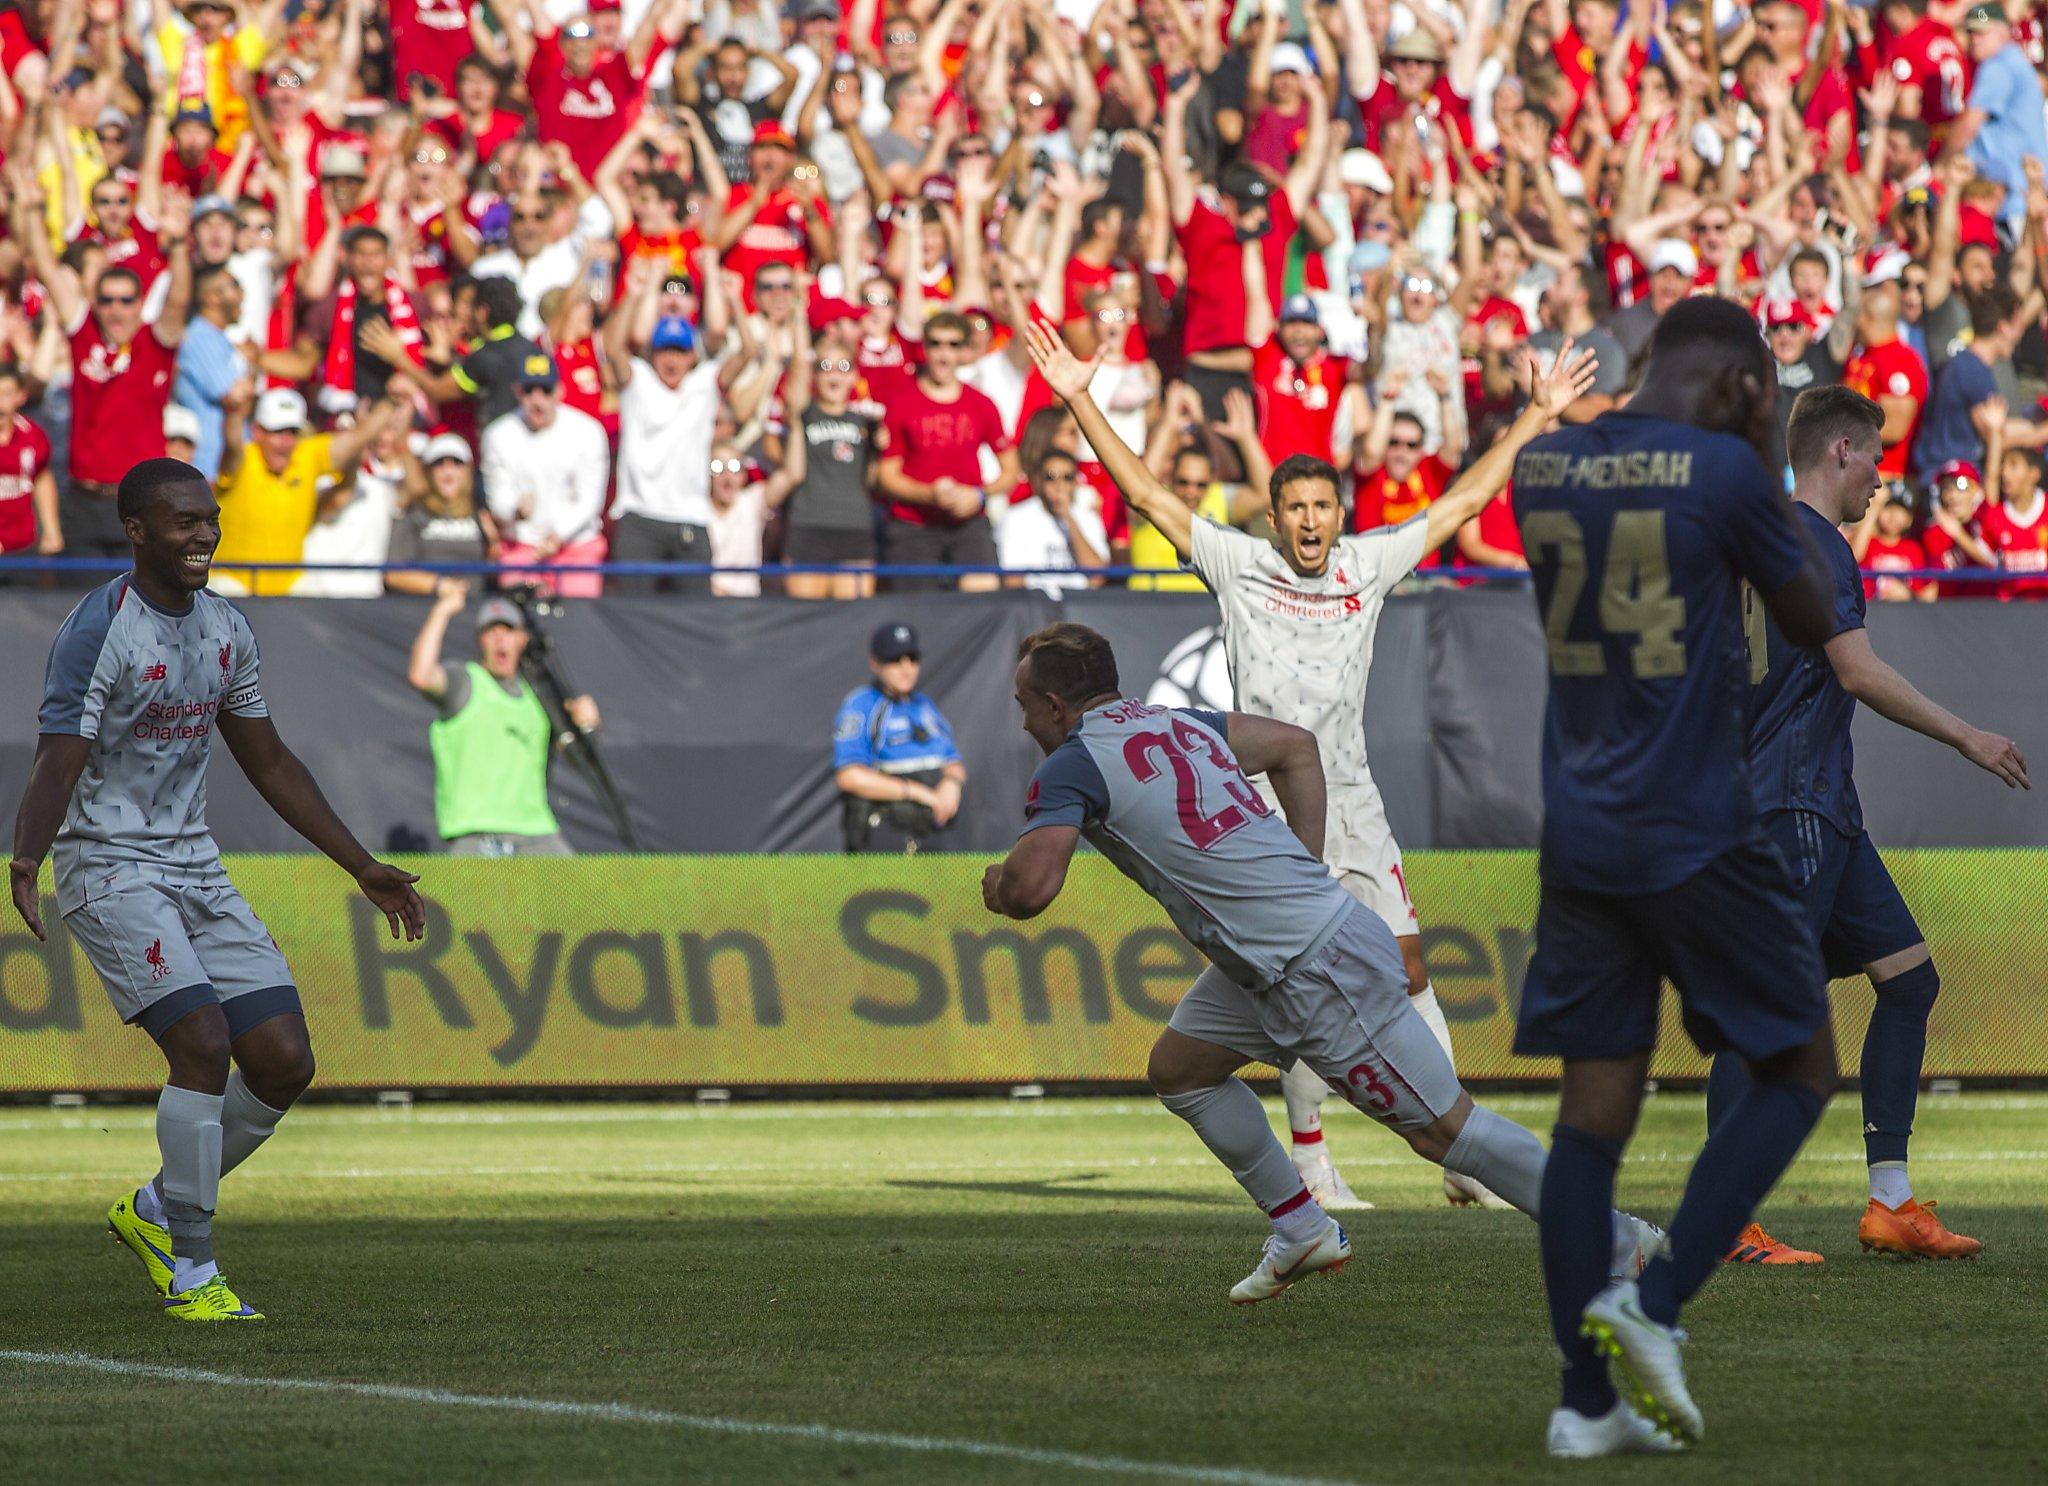 Shaqiri's goal highlights Liverpool's 4-1 win